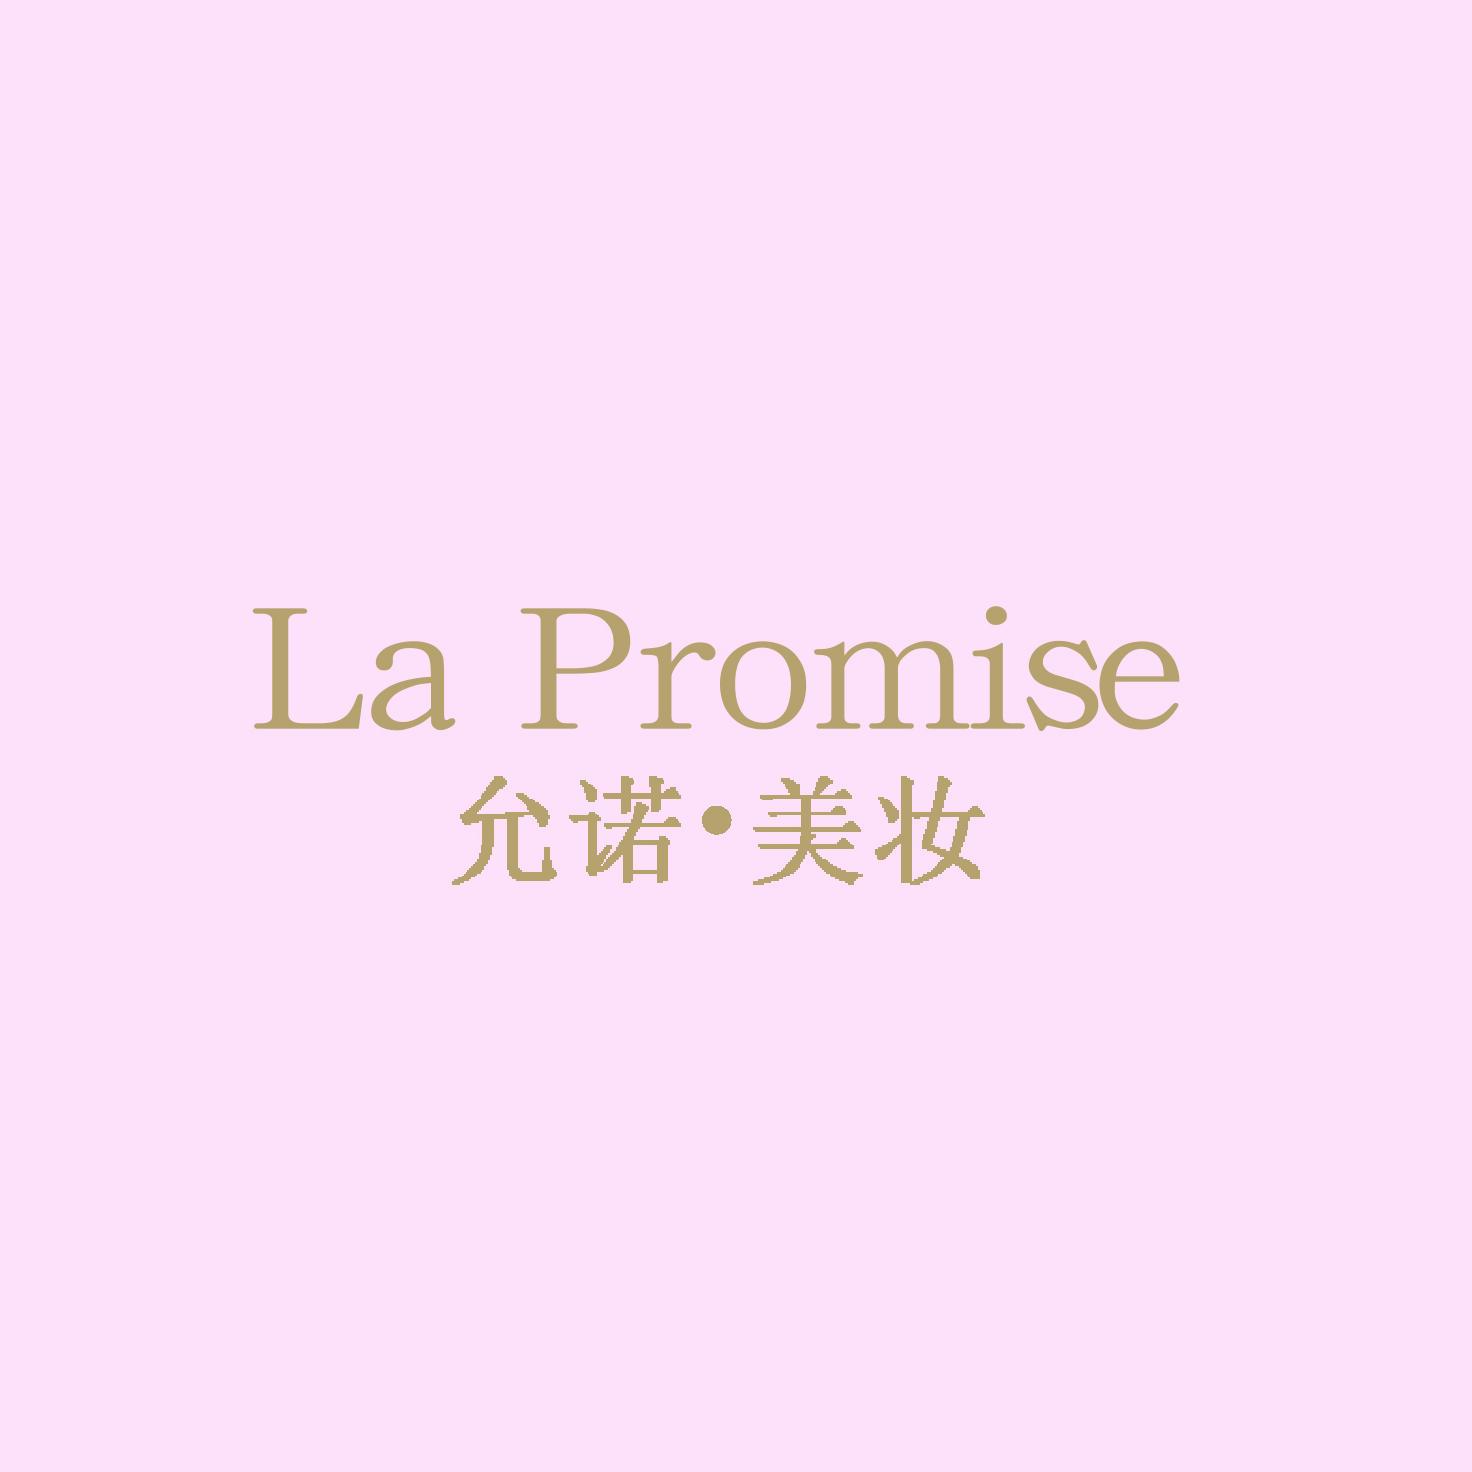 La Promise允诺美妆